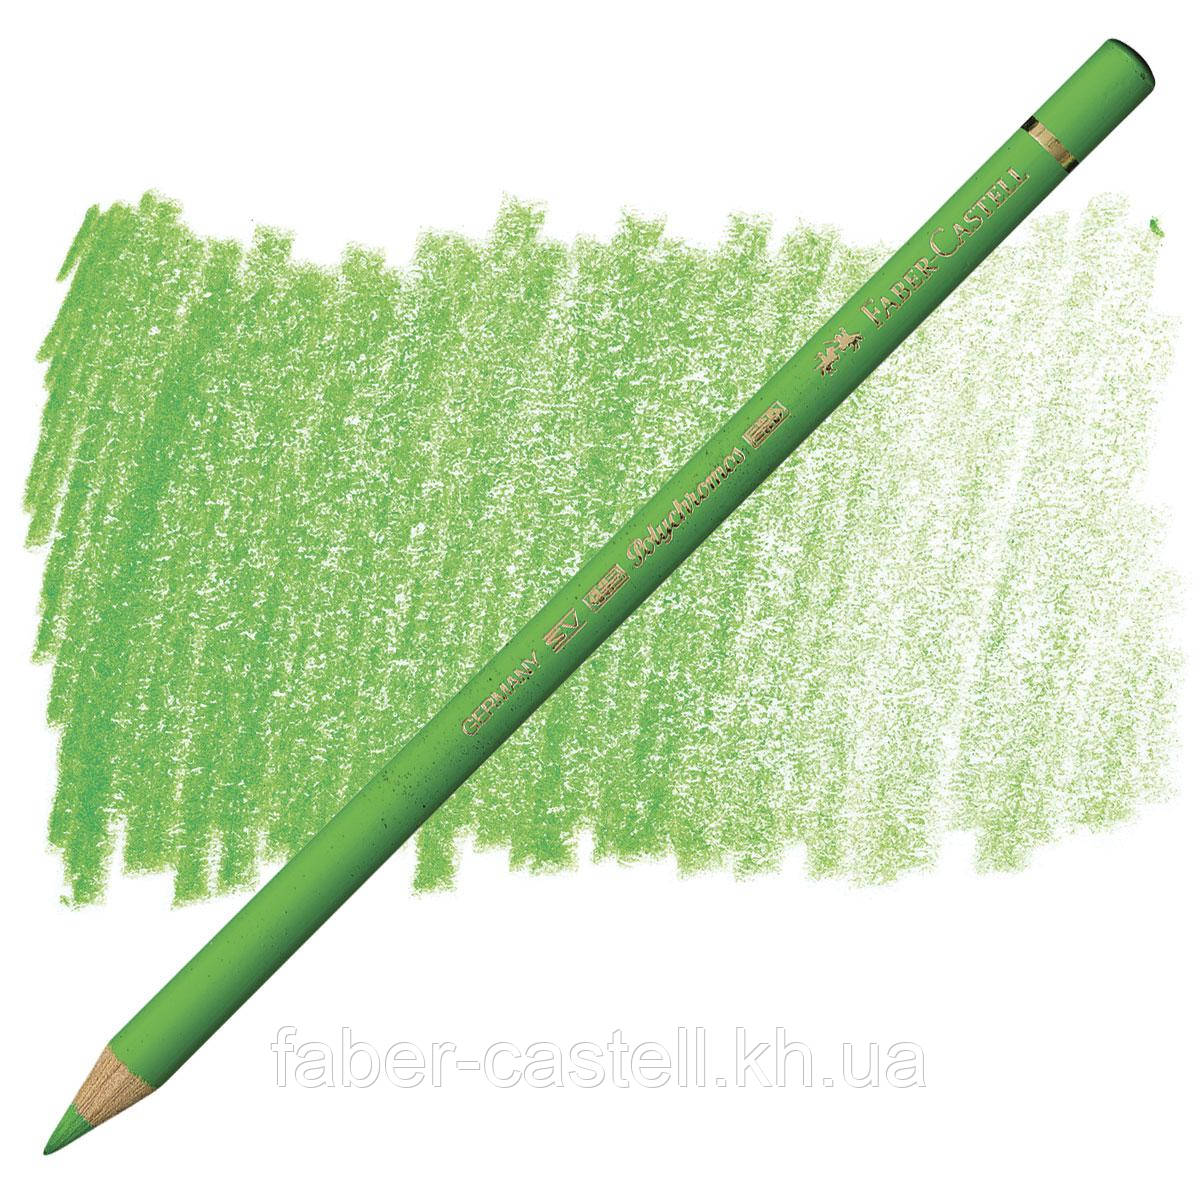 Карандаш цветной Faber-Castell POLYCHROMOS травяная зелень №166 (Grass Green), 110166